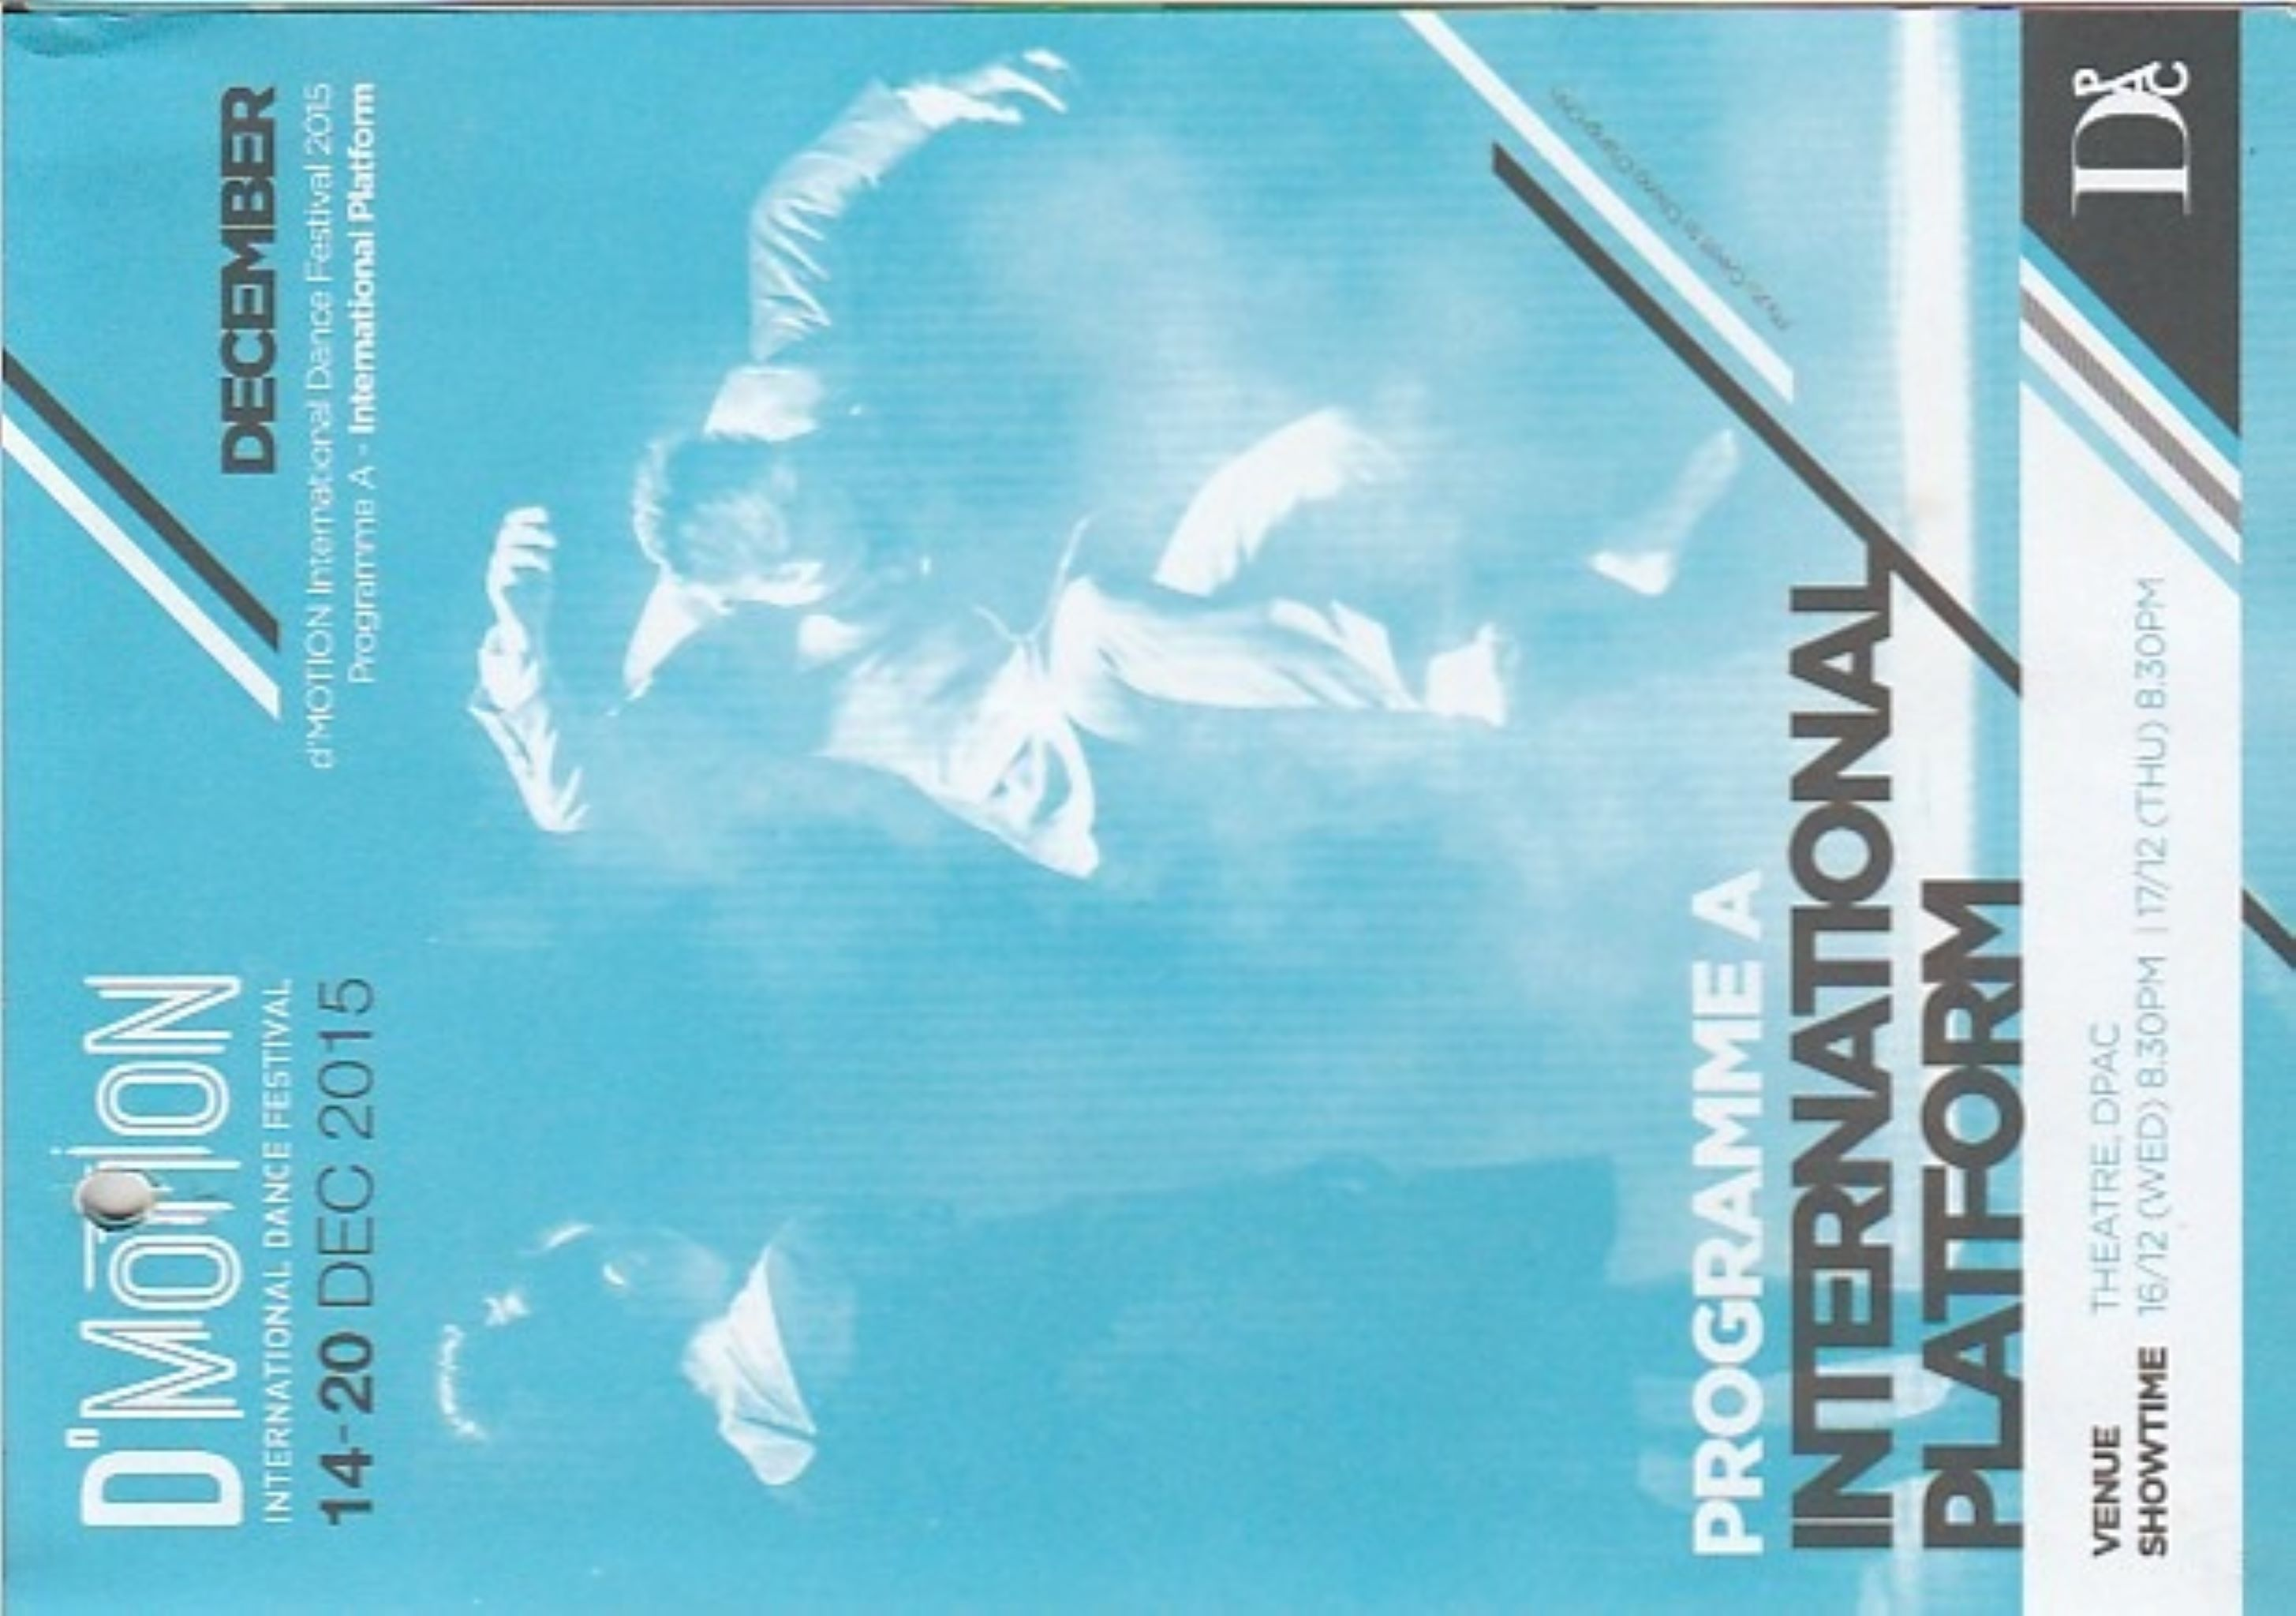 2015 DMotion Programme A International Platform Cover